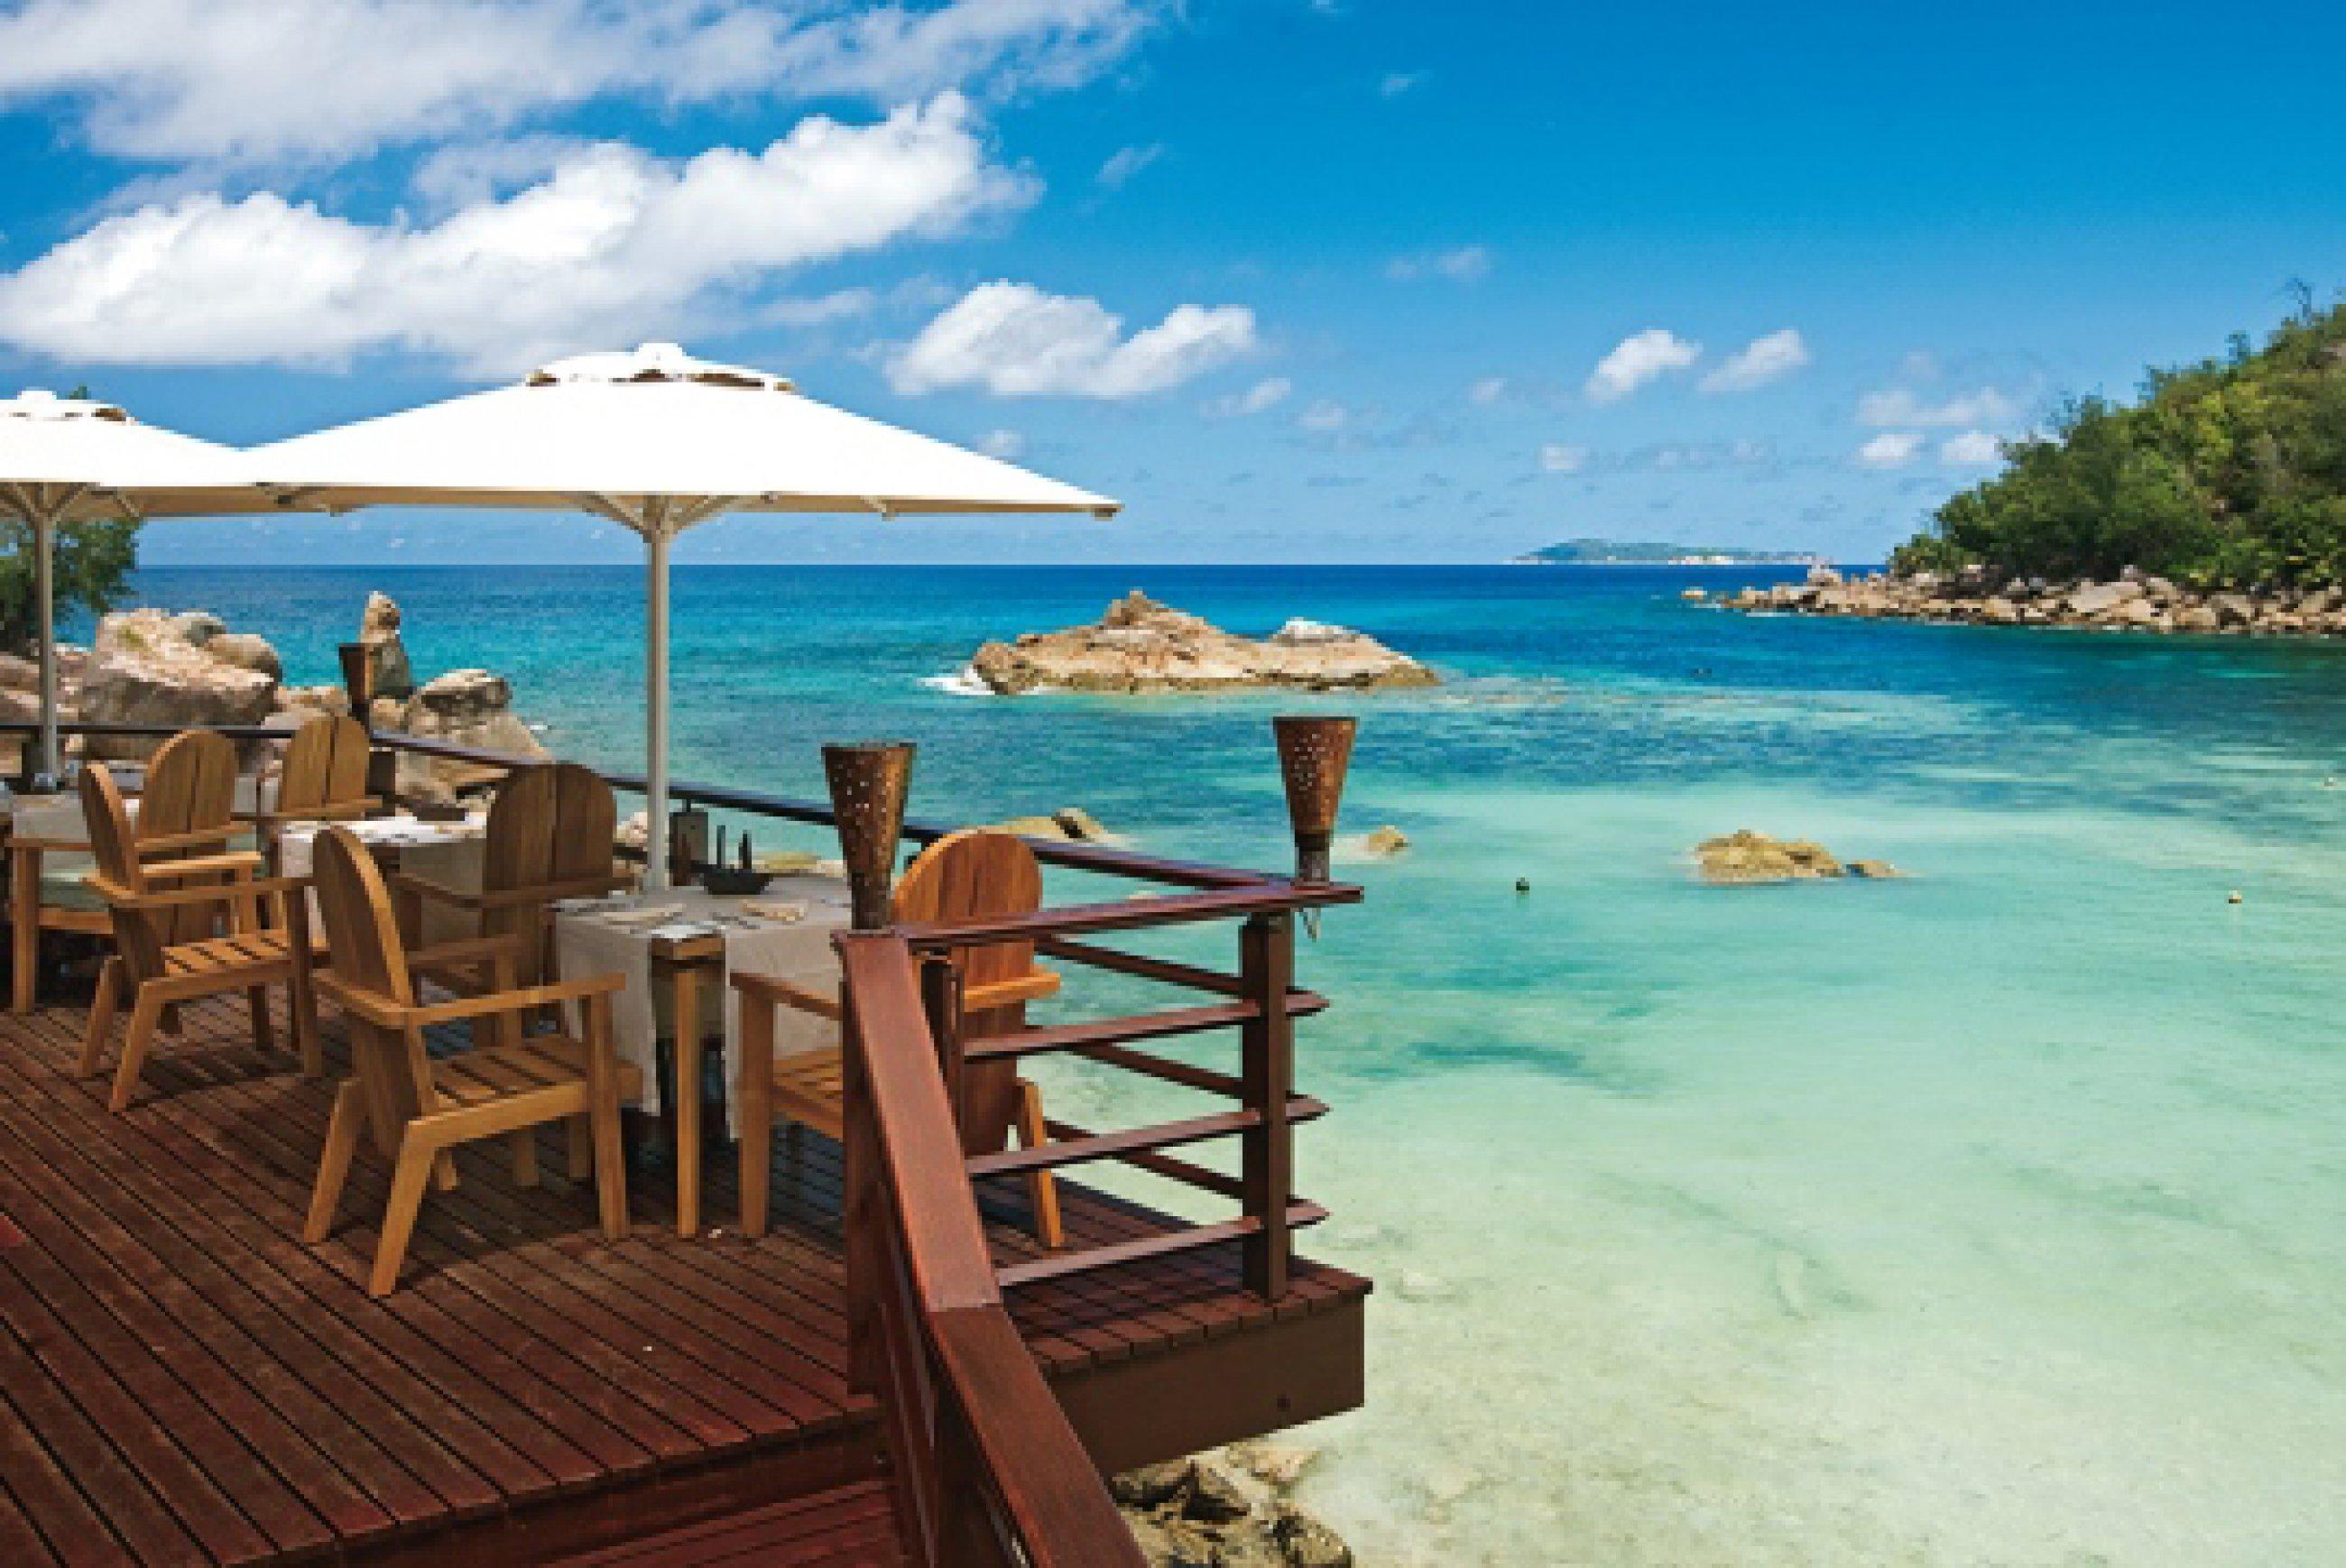 https://bubo.sk/uploads/galleries/16287/lemuria-seychelles-beach-bar-grill-4.jpg